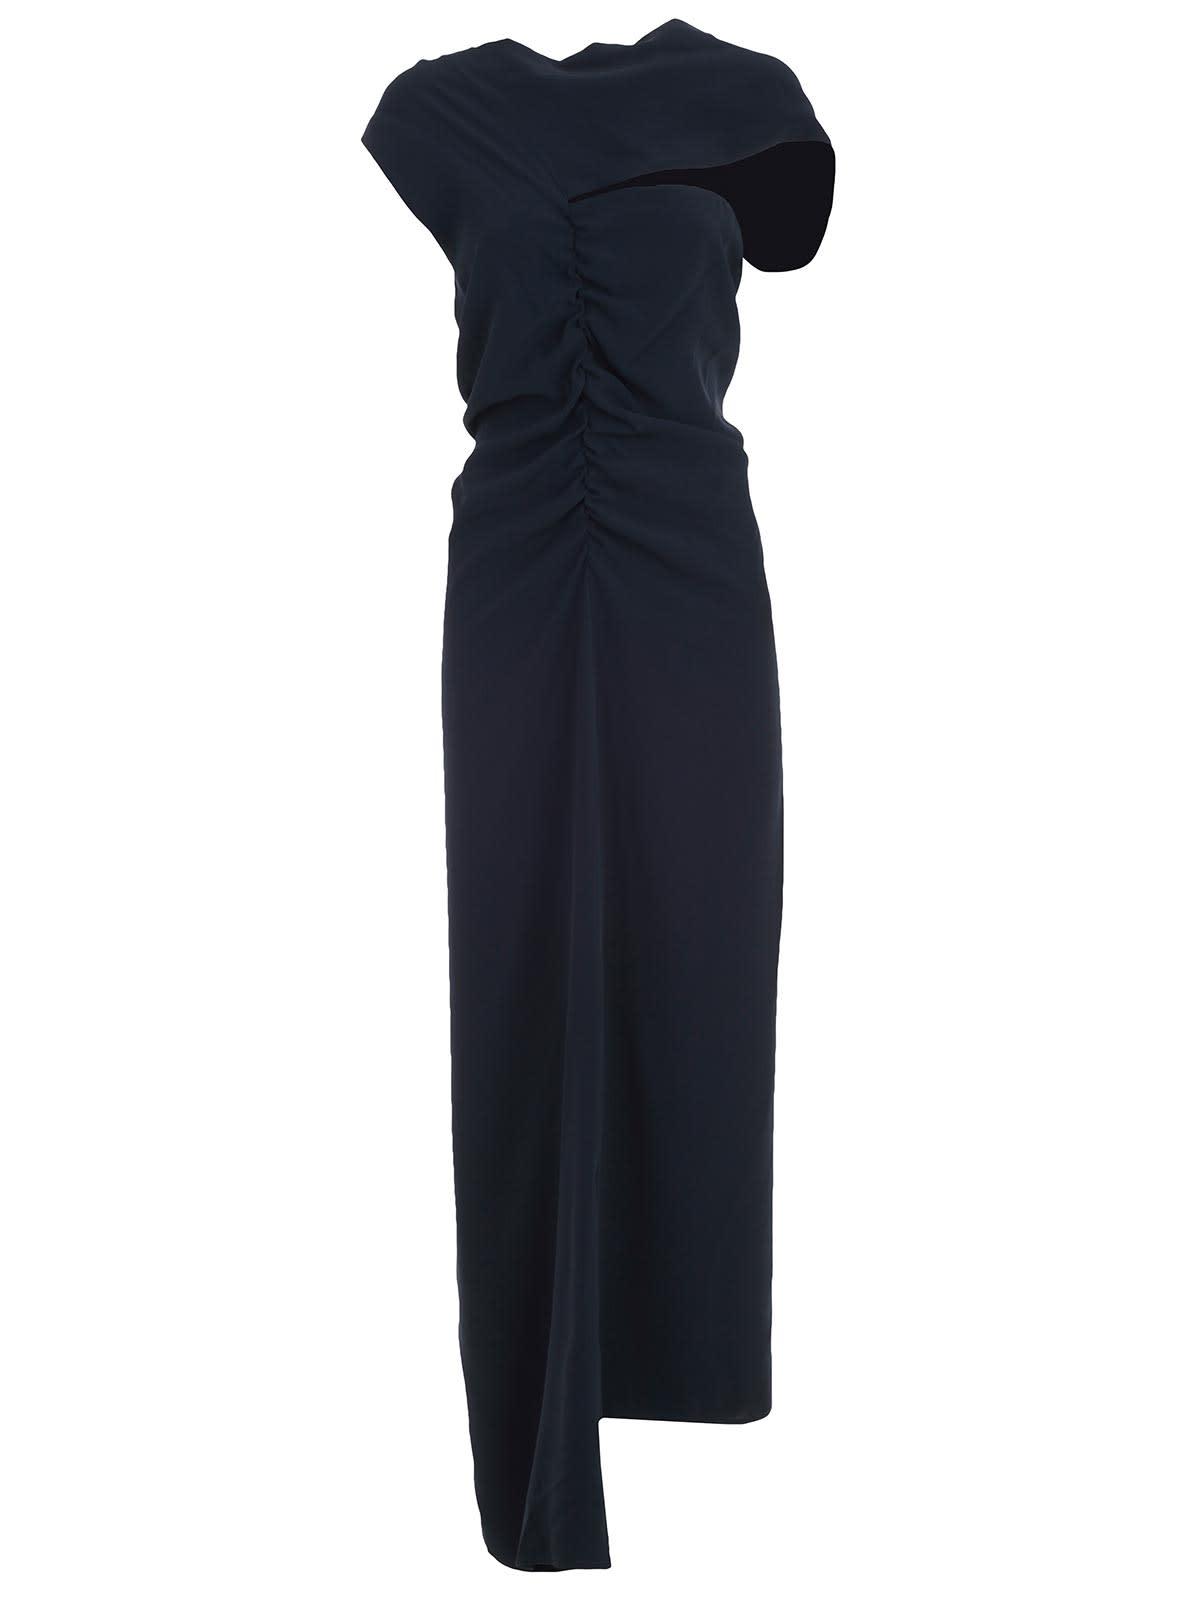 Colville Dress W & s Cady W & drape